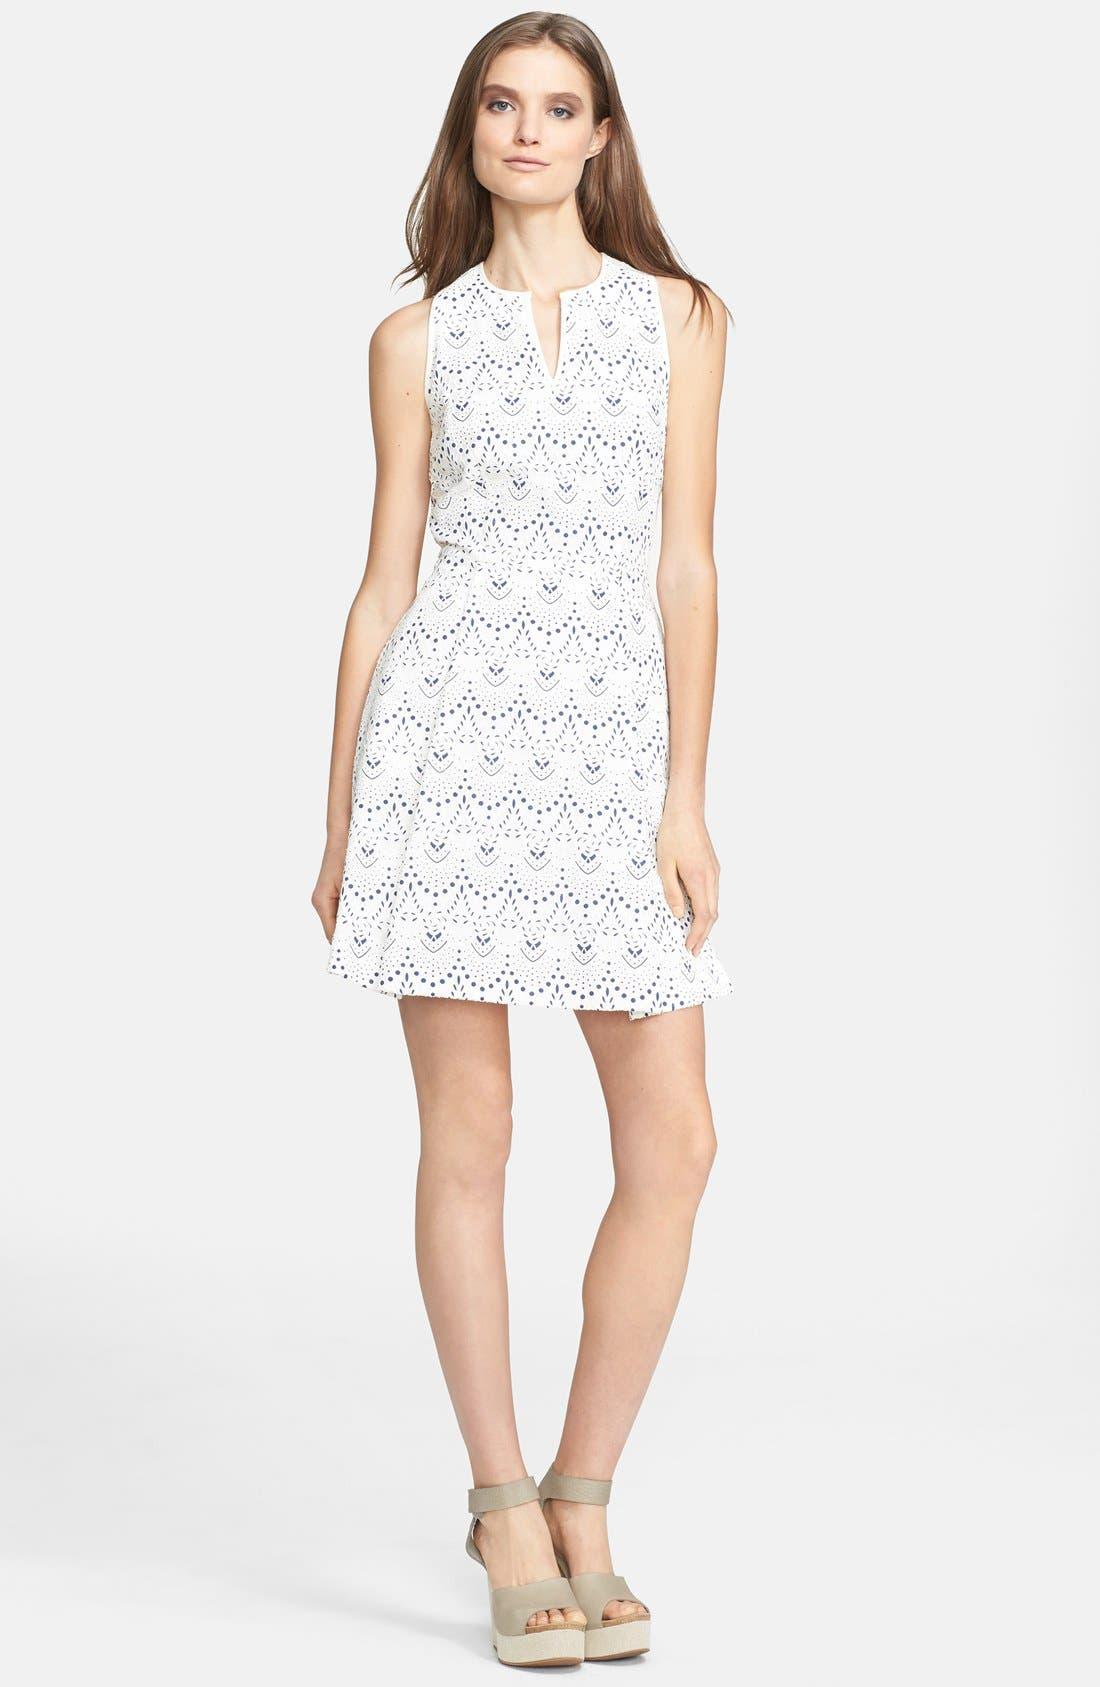 Alternate Image 1 Selected - Mcginn 'Kara' Lace Fit & Flare Dress